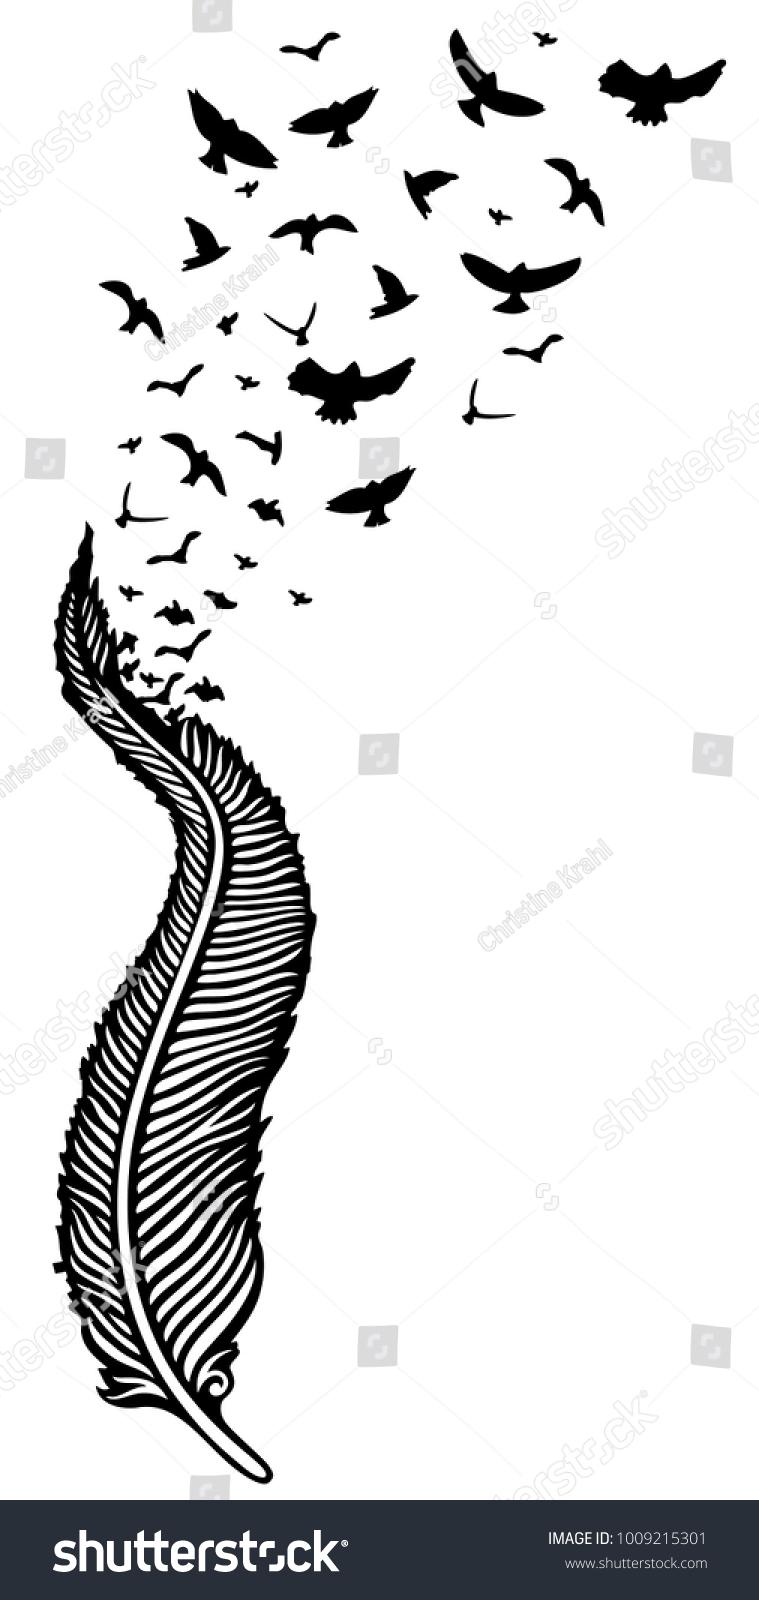 Feather swarm birds symbol hope stock vector 1009215301 shutterstock feather with swarm of birds symbol of hope buycottarizona Image collections